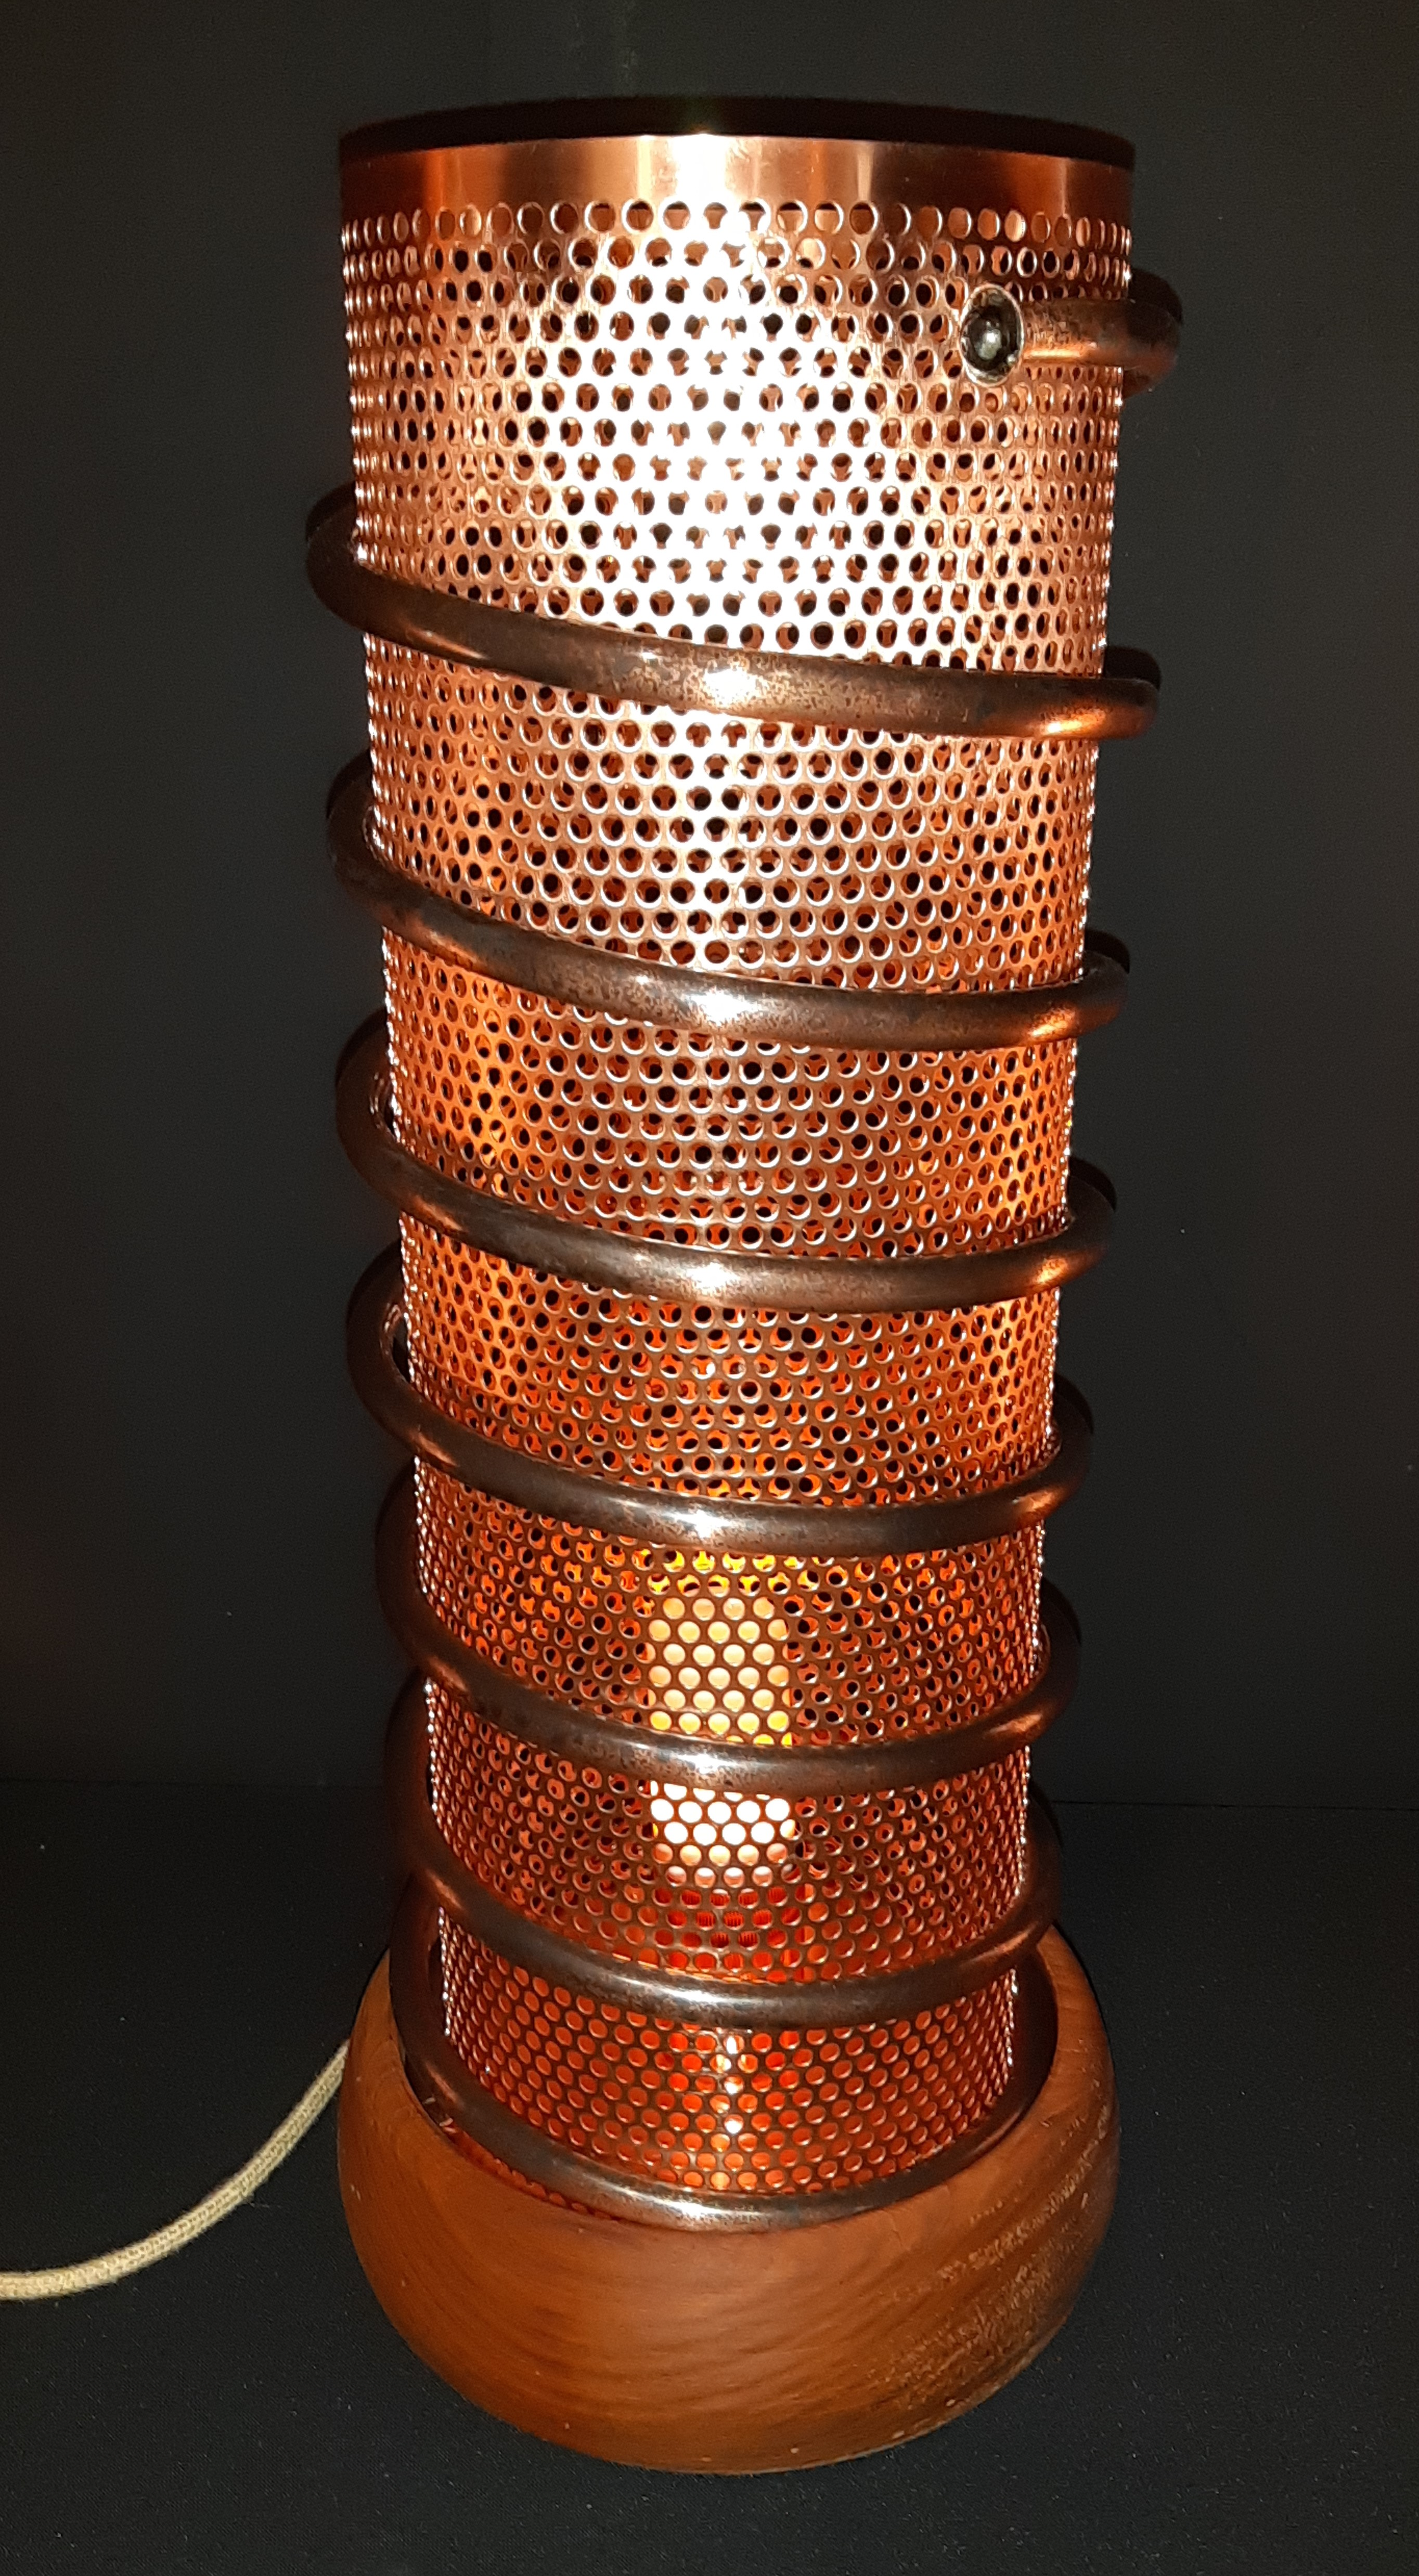 lampe cuivre et bois, lampe originale, lampe design